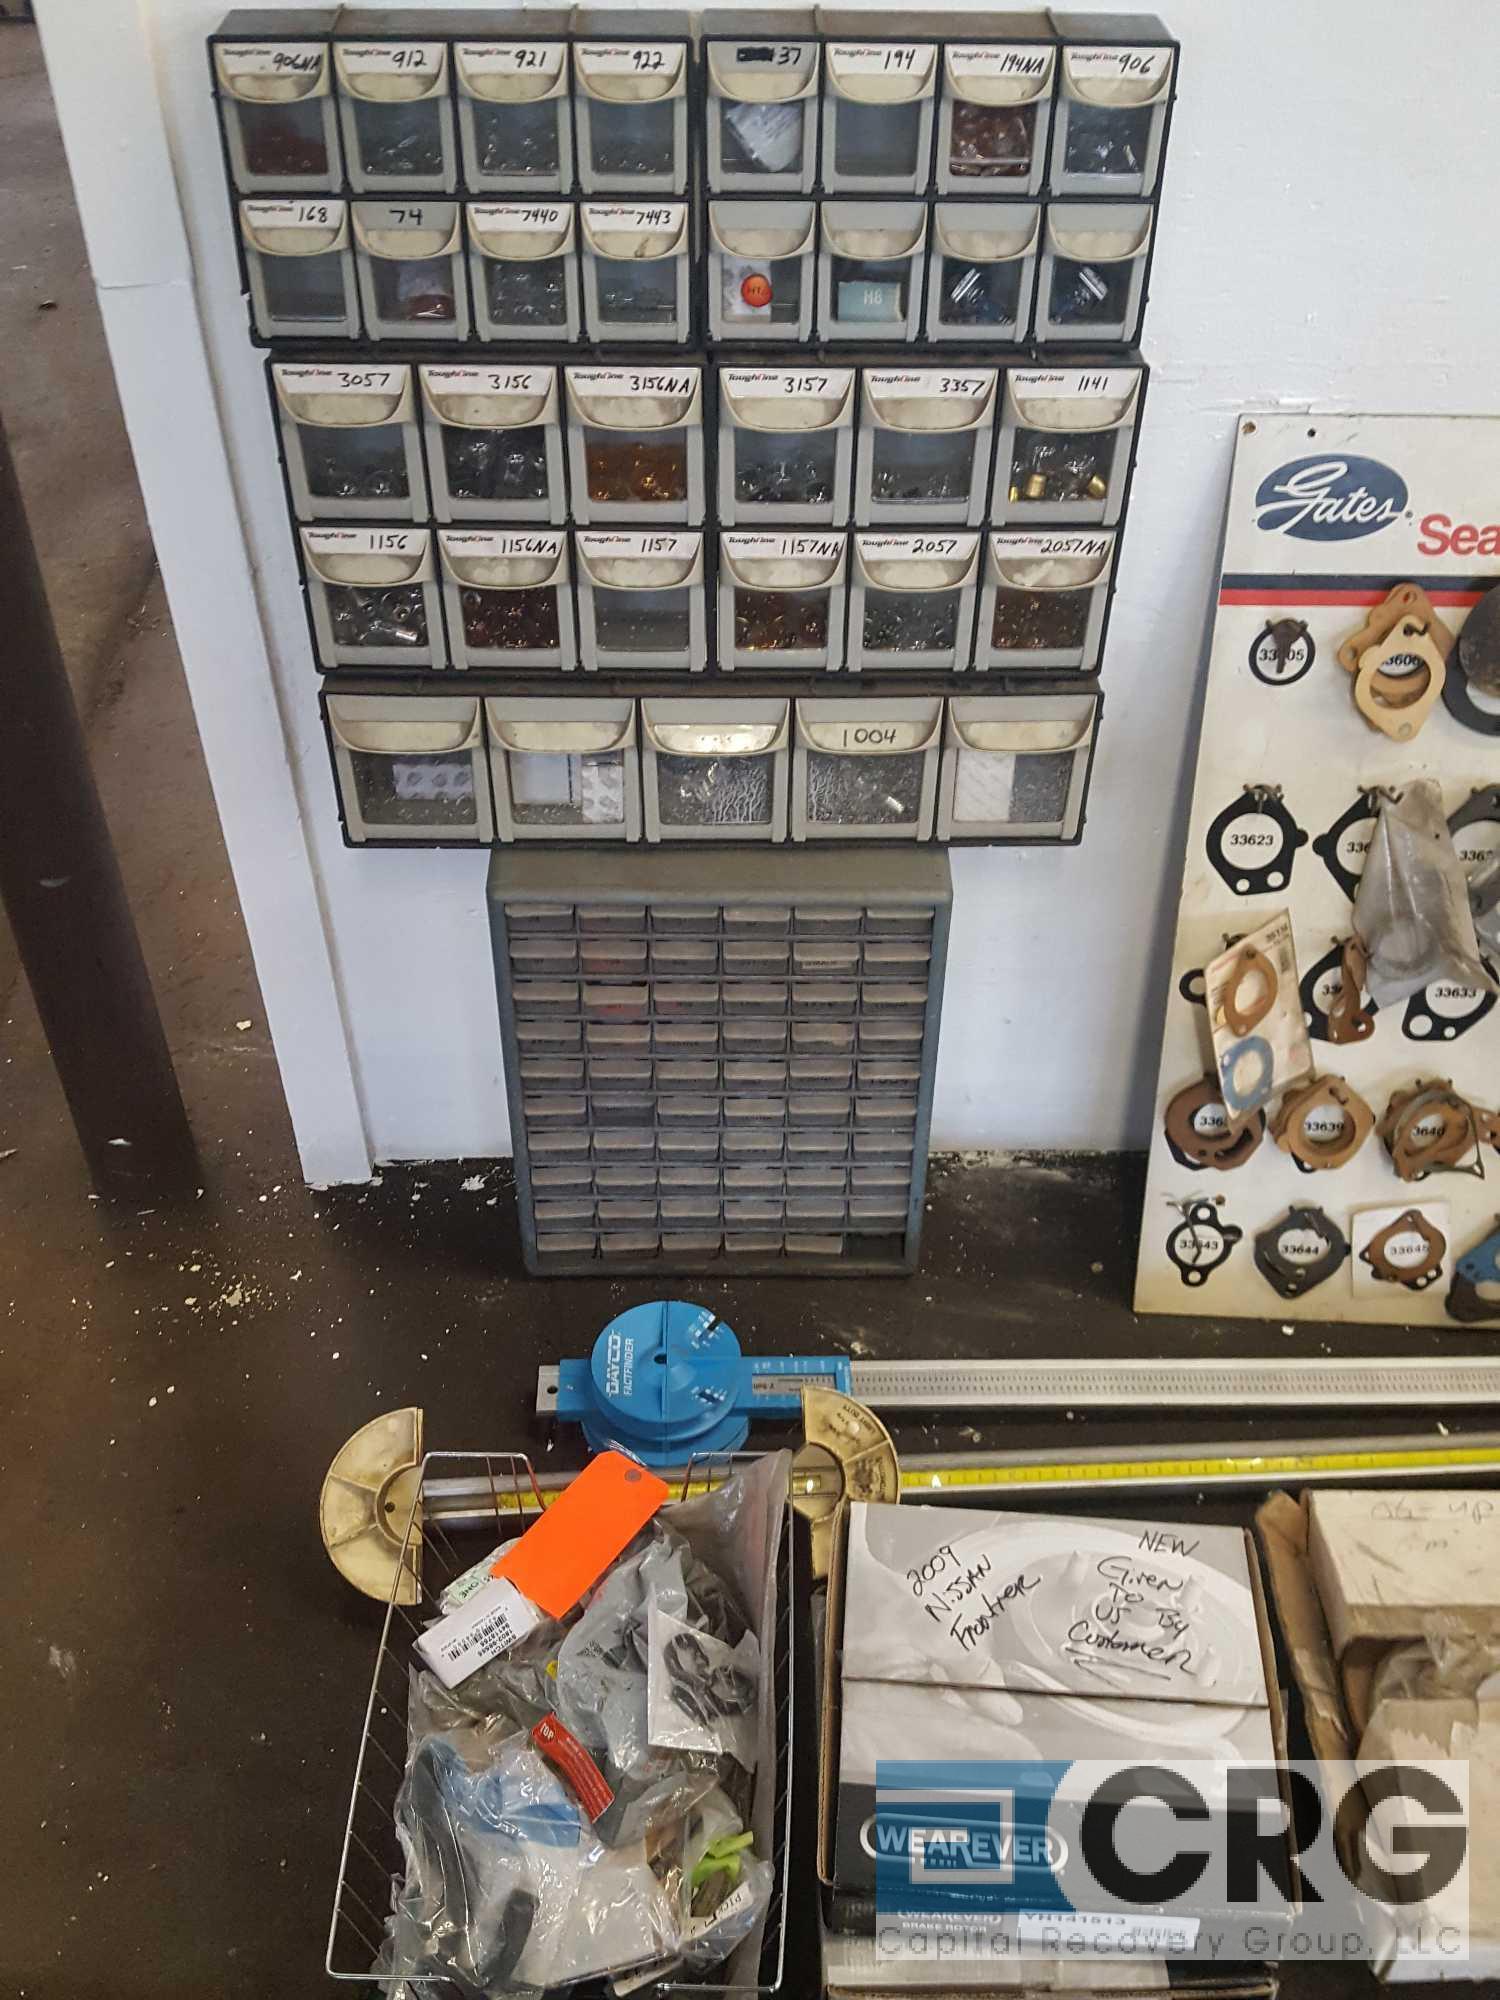 Lot of assorted automotive accessories etc. ; including Napa fuel line hose, vacuum tubing, - Image 4 of 4